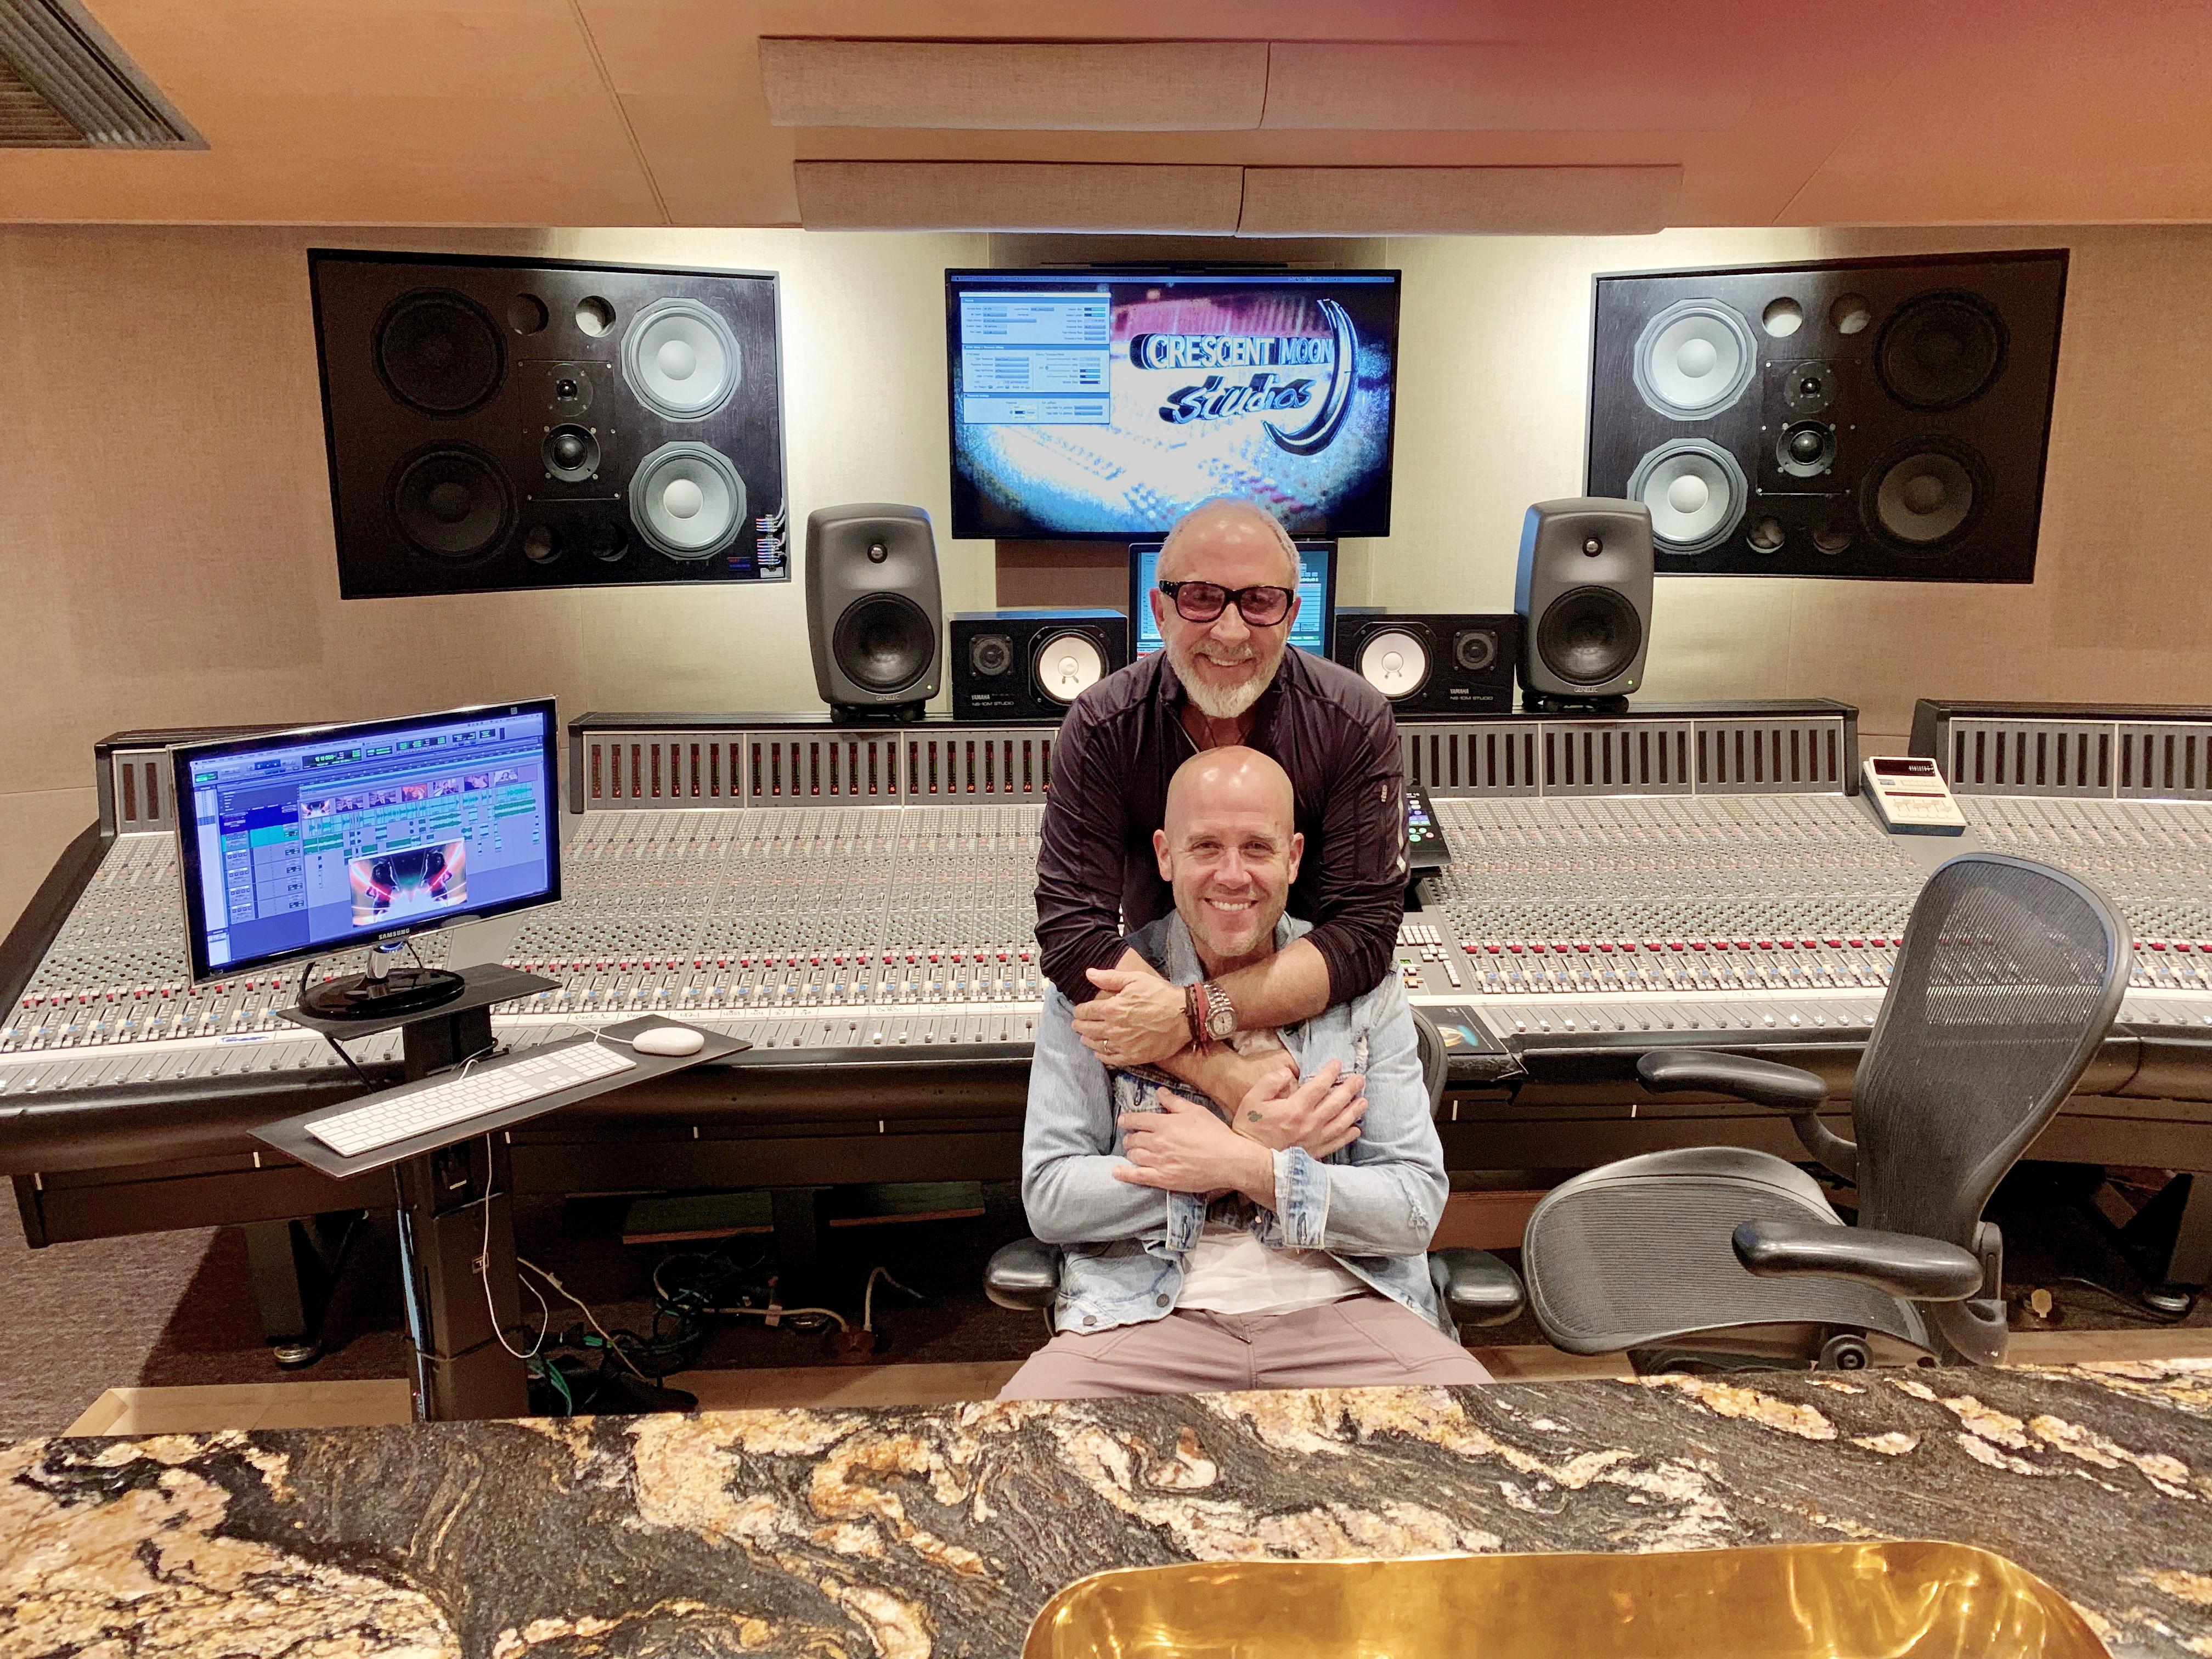 Emilio Estefan y Gian Marco - Hot List - 5 - September 2019